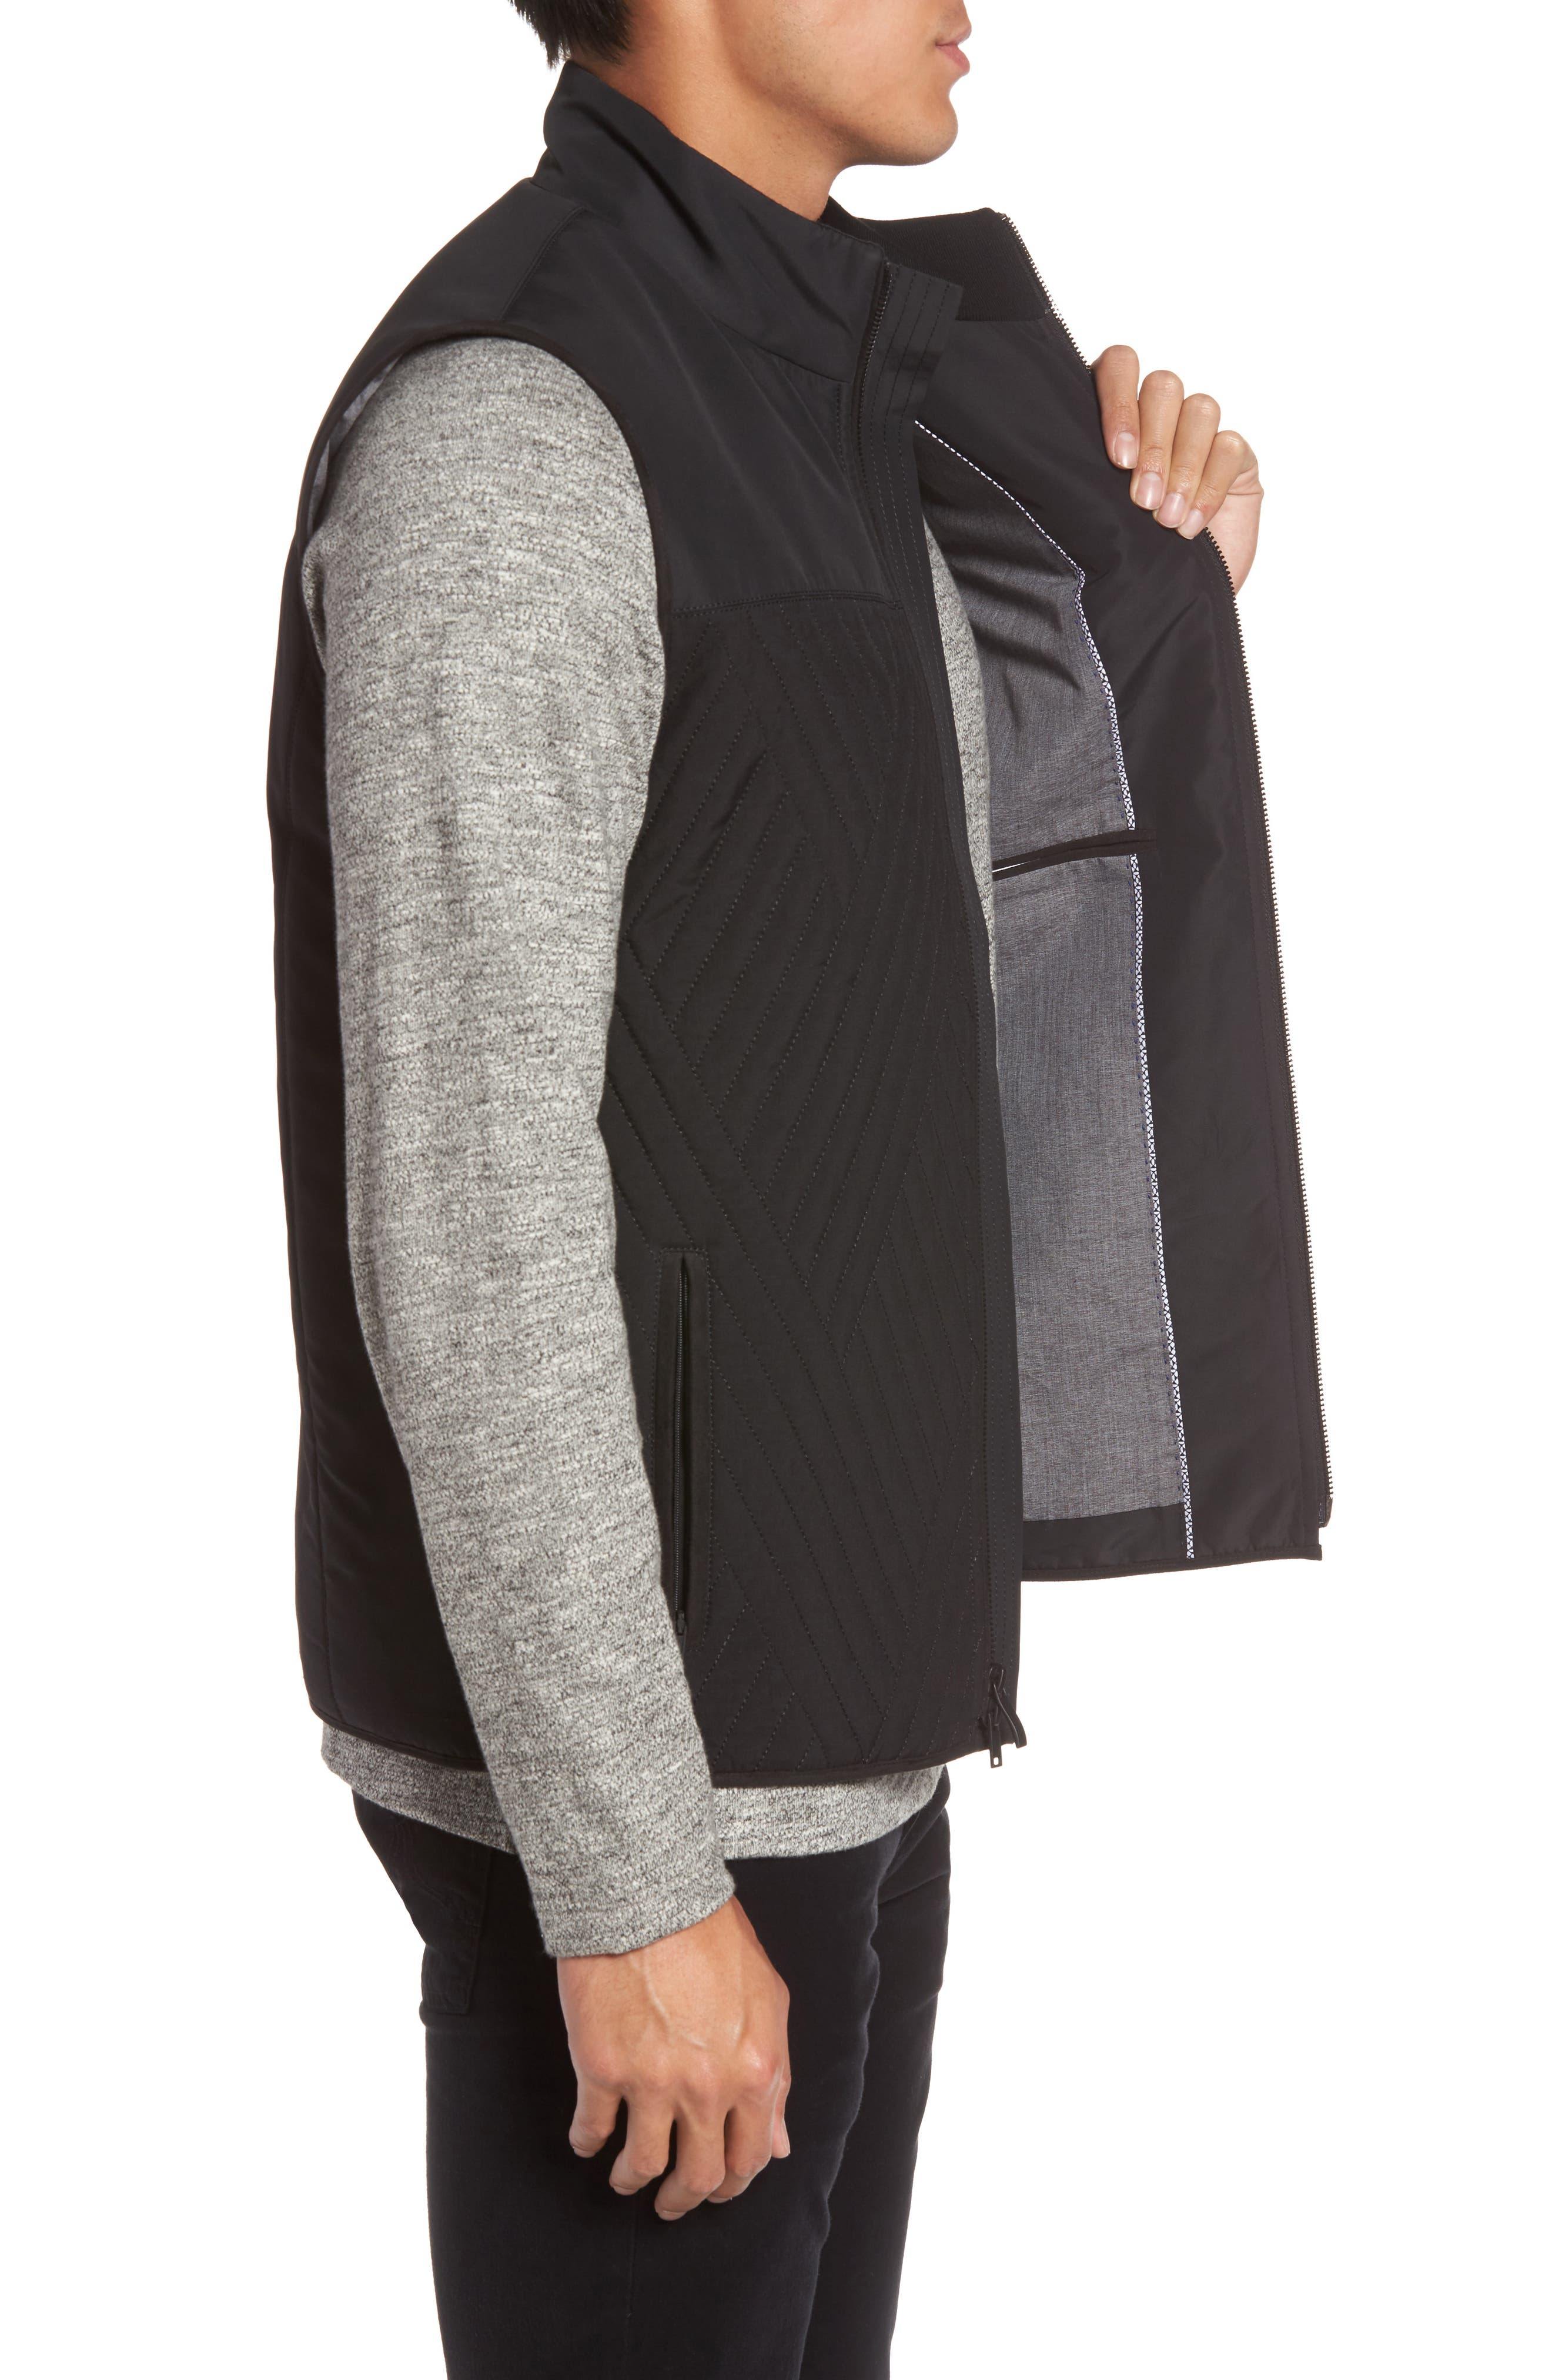 VINCE CAMUTO,                             Slim Fit Quilted Vest,                             Alternate thumbnail 3, color,                             BLACK